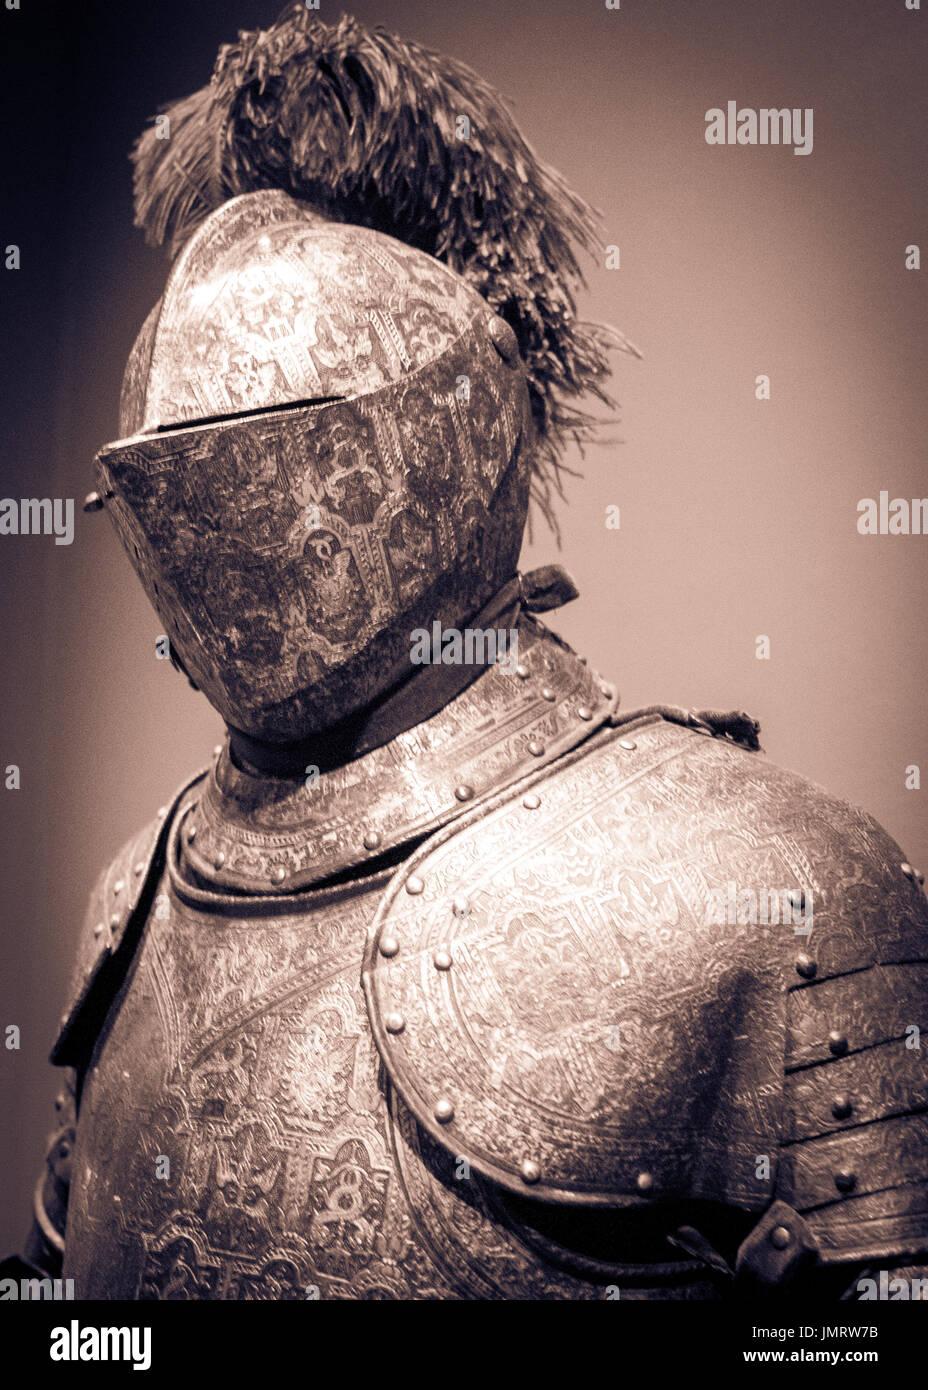 armor - Stock Image